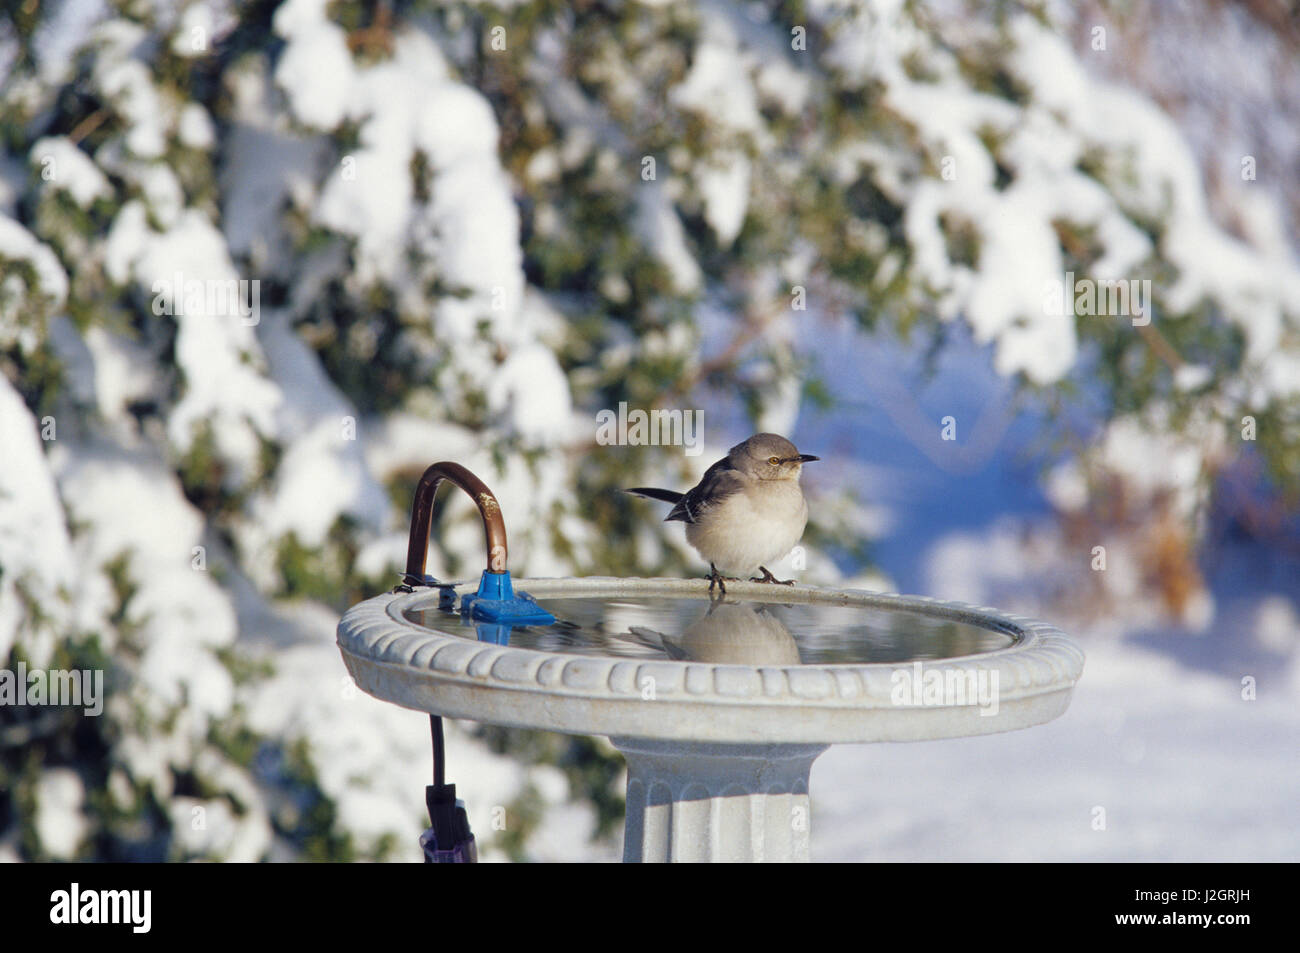 Passeriformes Passerine Ornithology Stockfotos & Passeriformes ...